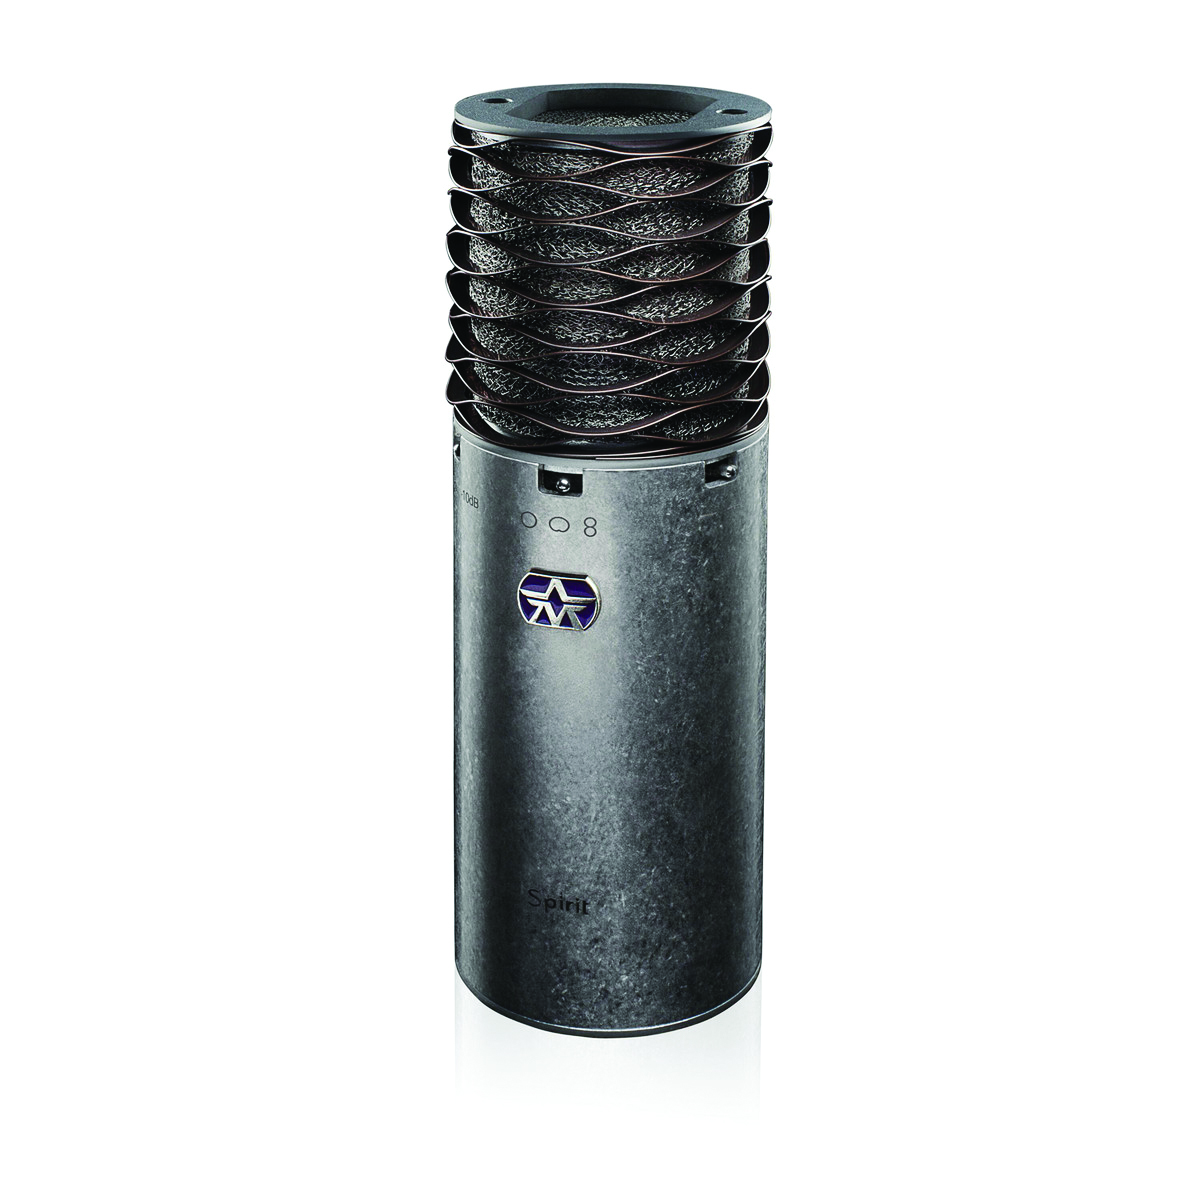 6 of the best: microphones